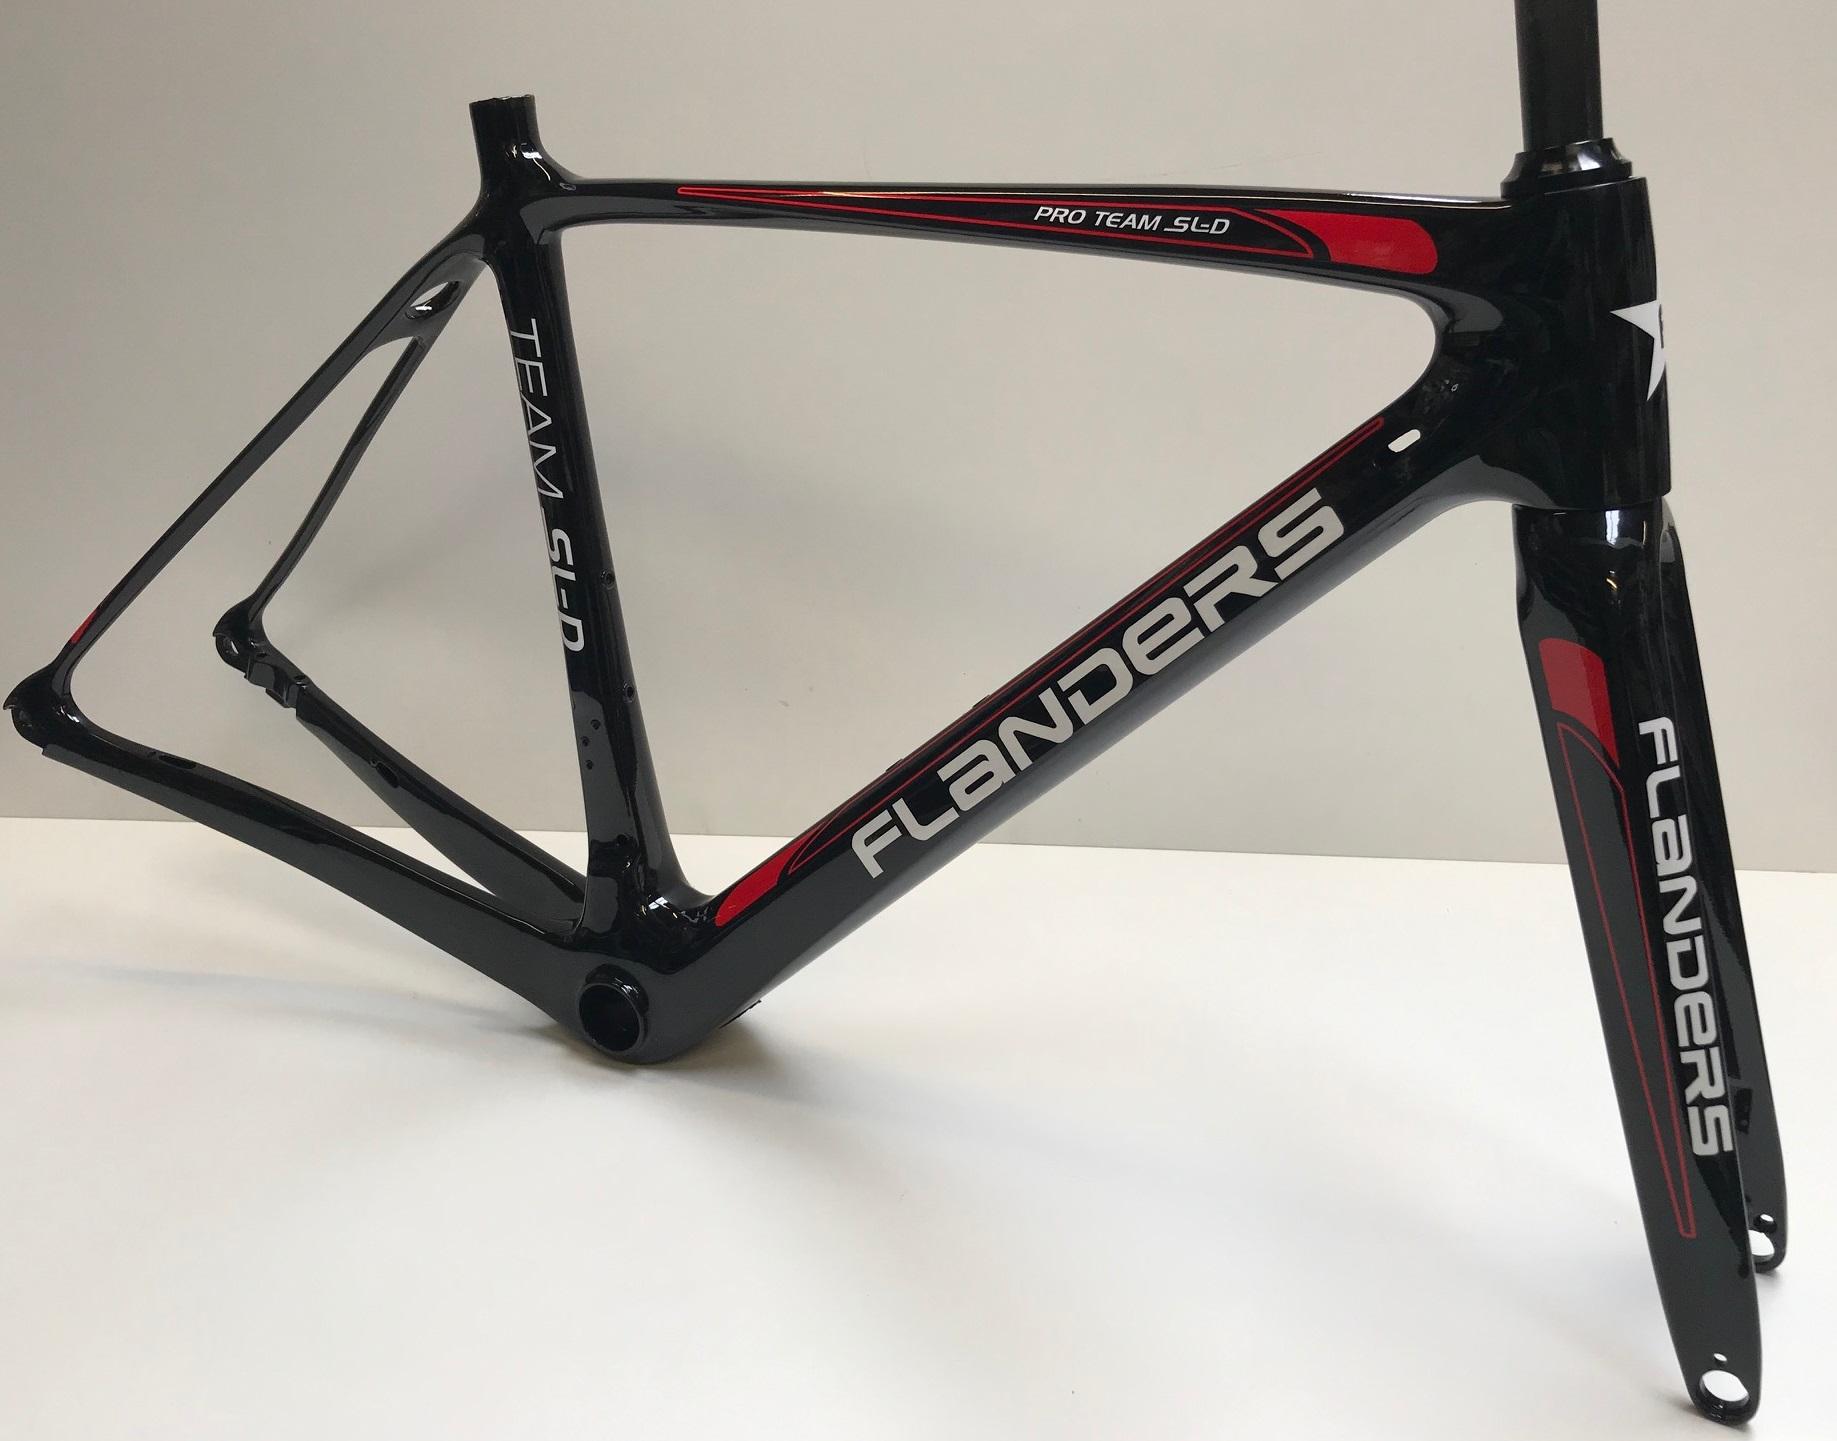 Frame Flanders Race Pro-Team SLD